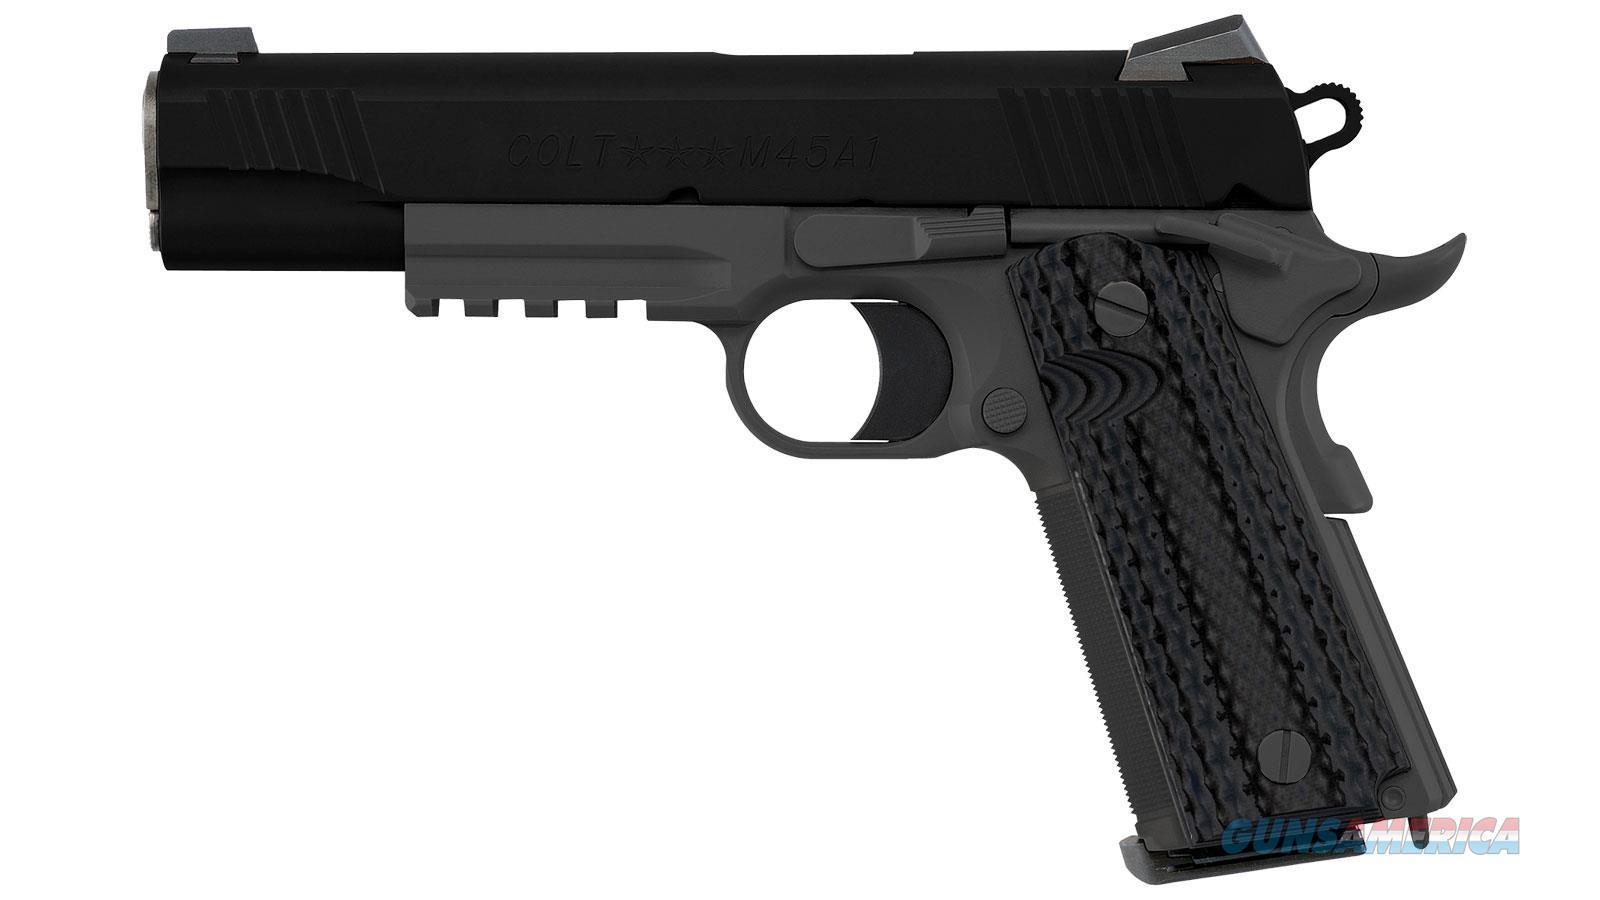 Colt Cmc Marine Pistol 45Acp 5 Cerokote Ns O1070CQB  Non-Guns > Magazines & Clips > Pistol Magazines > Other